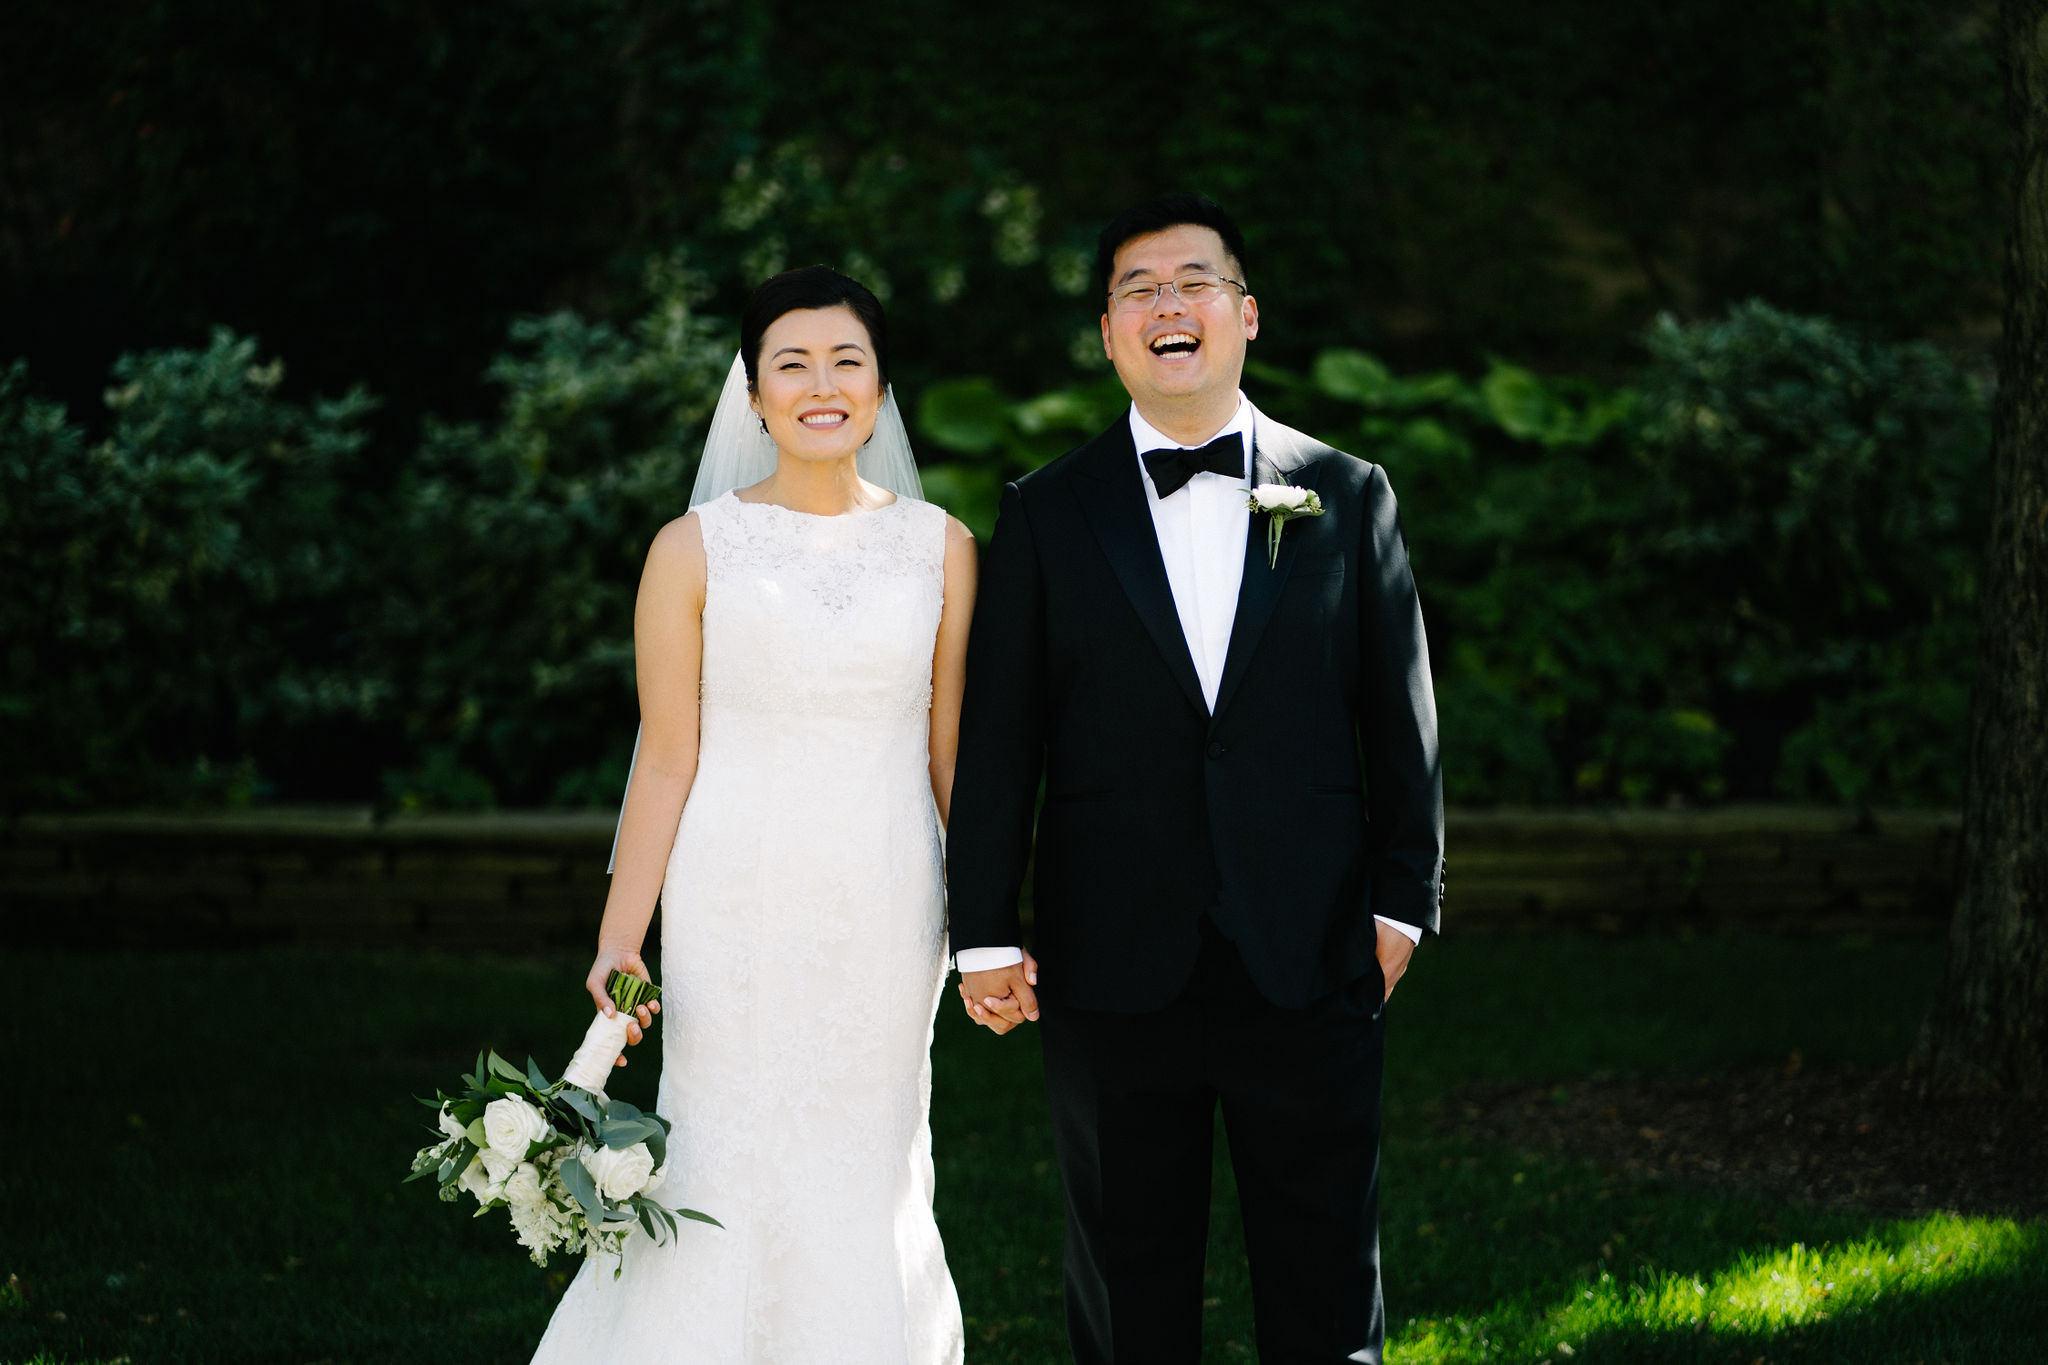 017-rempel-photography-chicago-wedding-inspiration-sara-philip-rockefeller-chapel-trump-tower.jpg